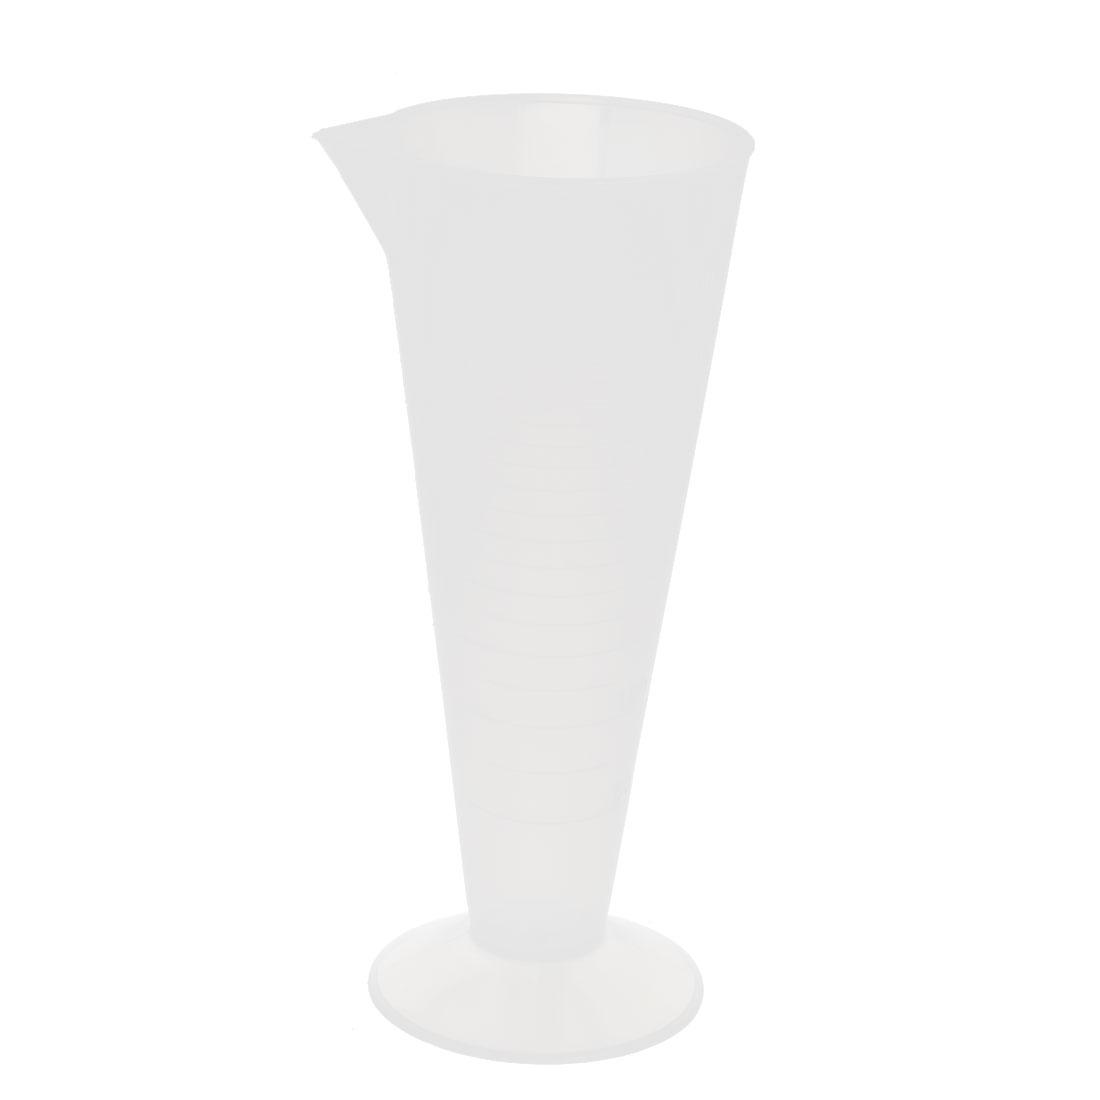 50ml-500ml Laboratory Using Water Liquid Testing Beaker Measuring Cup Thicken